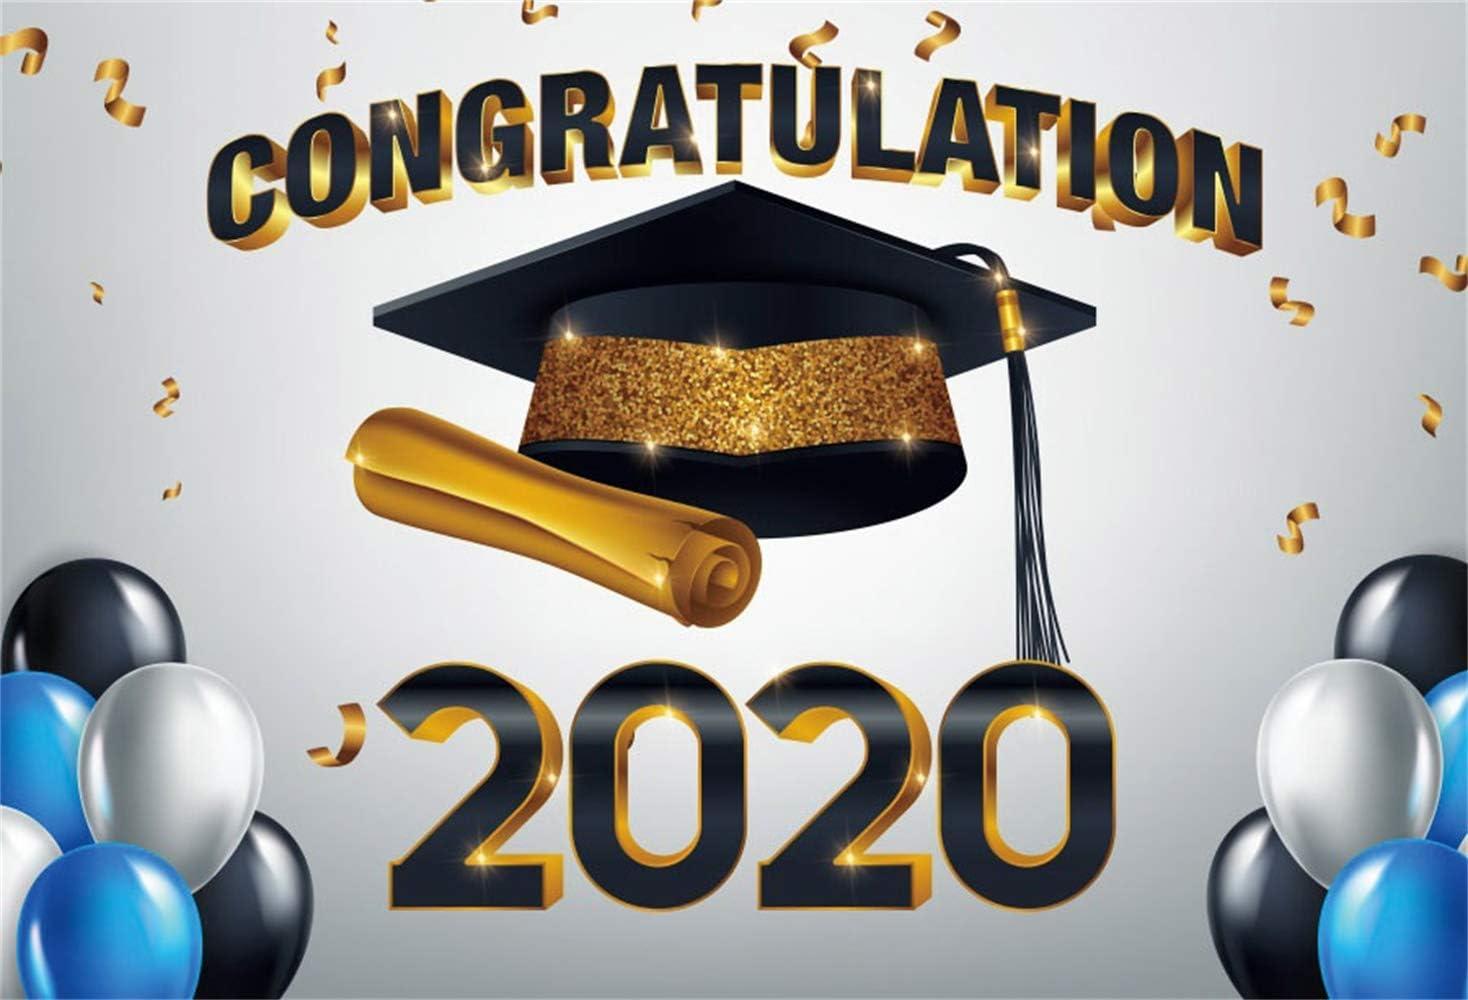 2019 Graduation Backdrop 5x3ft Trencher Cap Polyester Photography Background Glitter Golden Grad Cap Diploma Confetti Class Grad Ceremony Celebrate Party Prom Photo Prop Studio Decor Poster